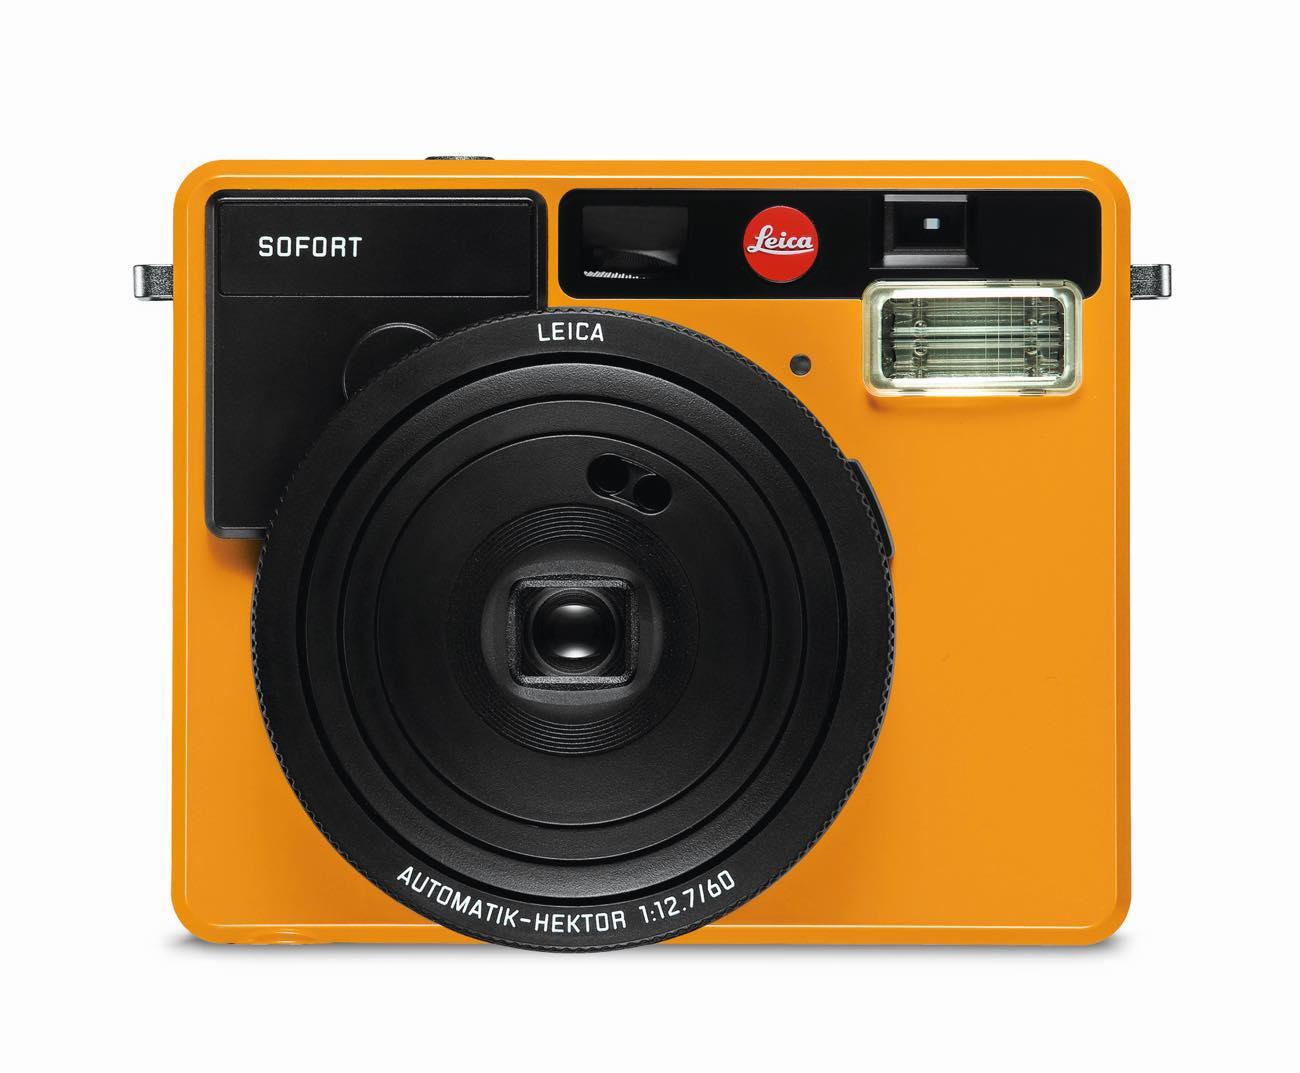 Leica Sofort_Orange_front-on